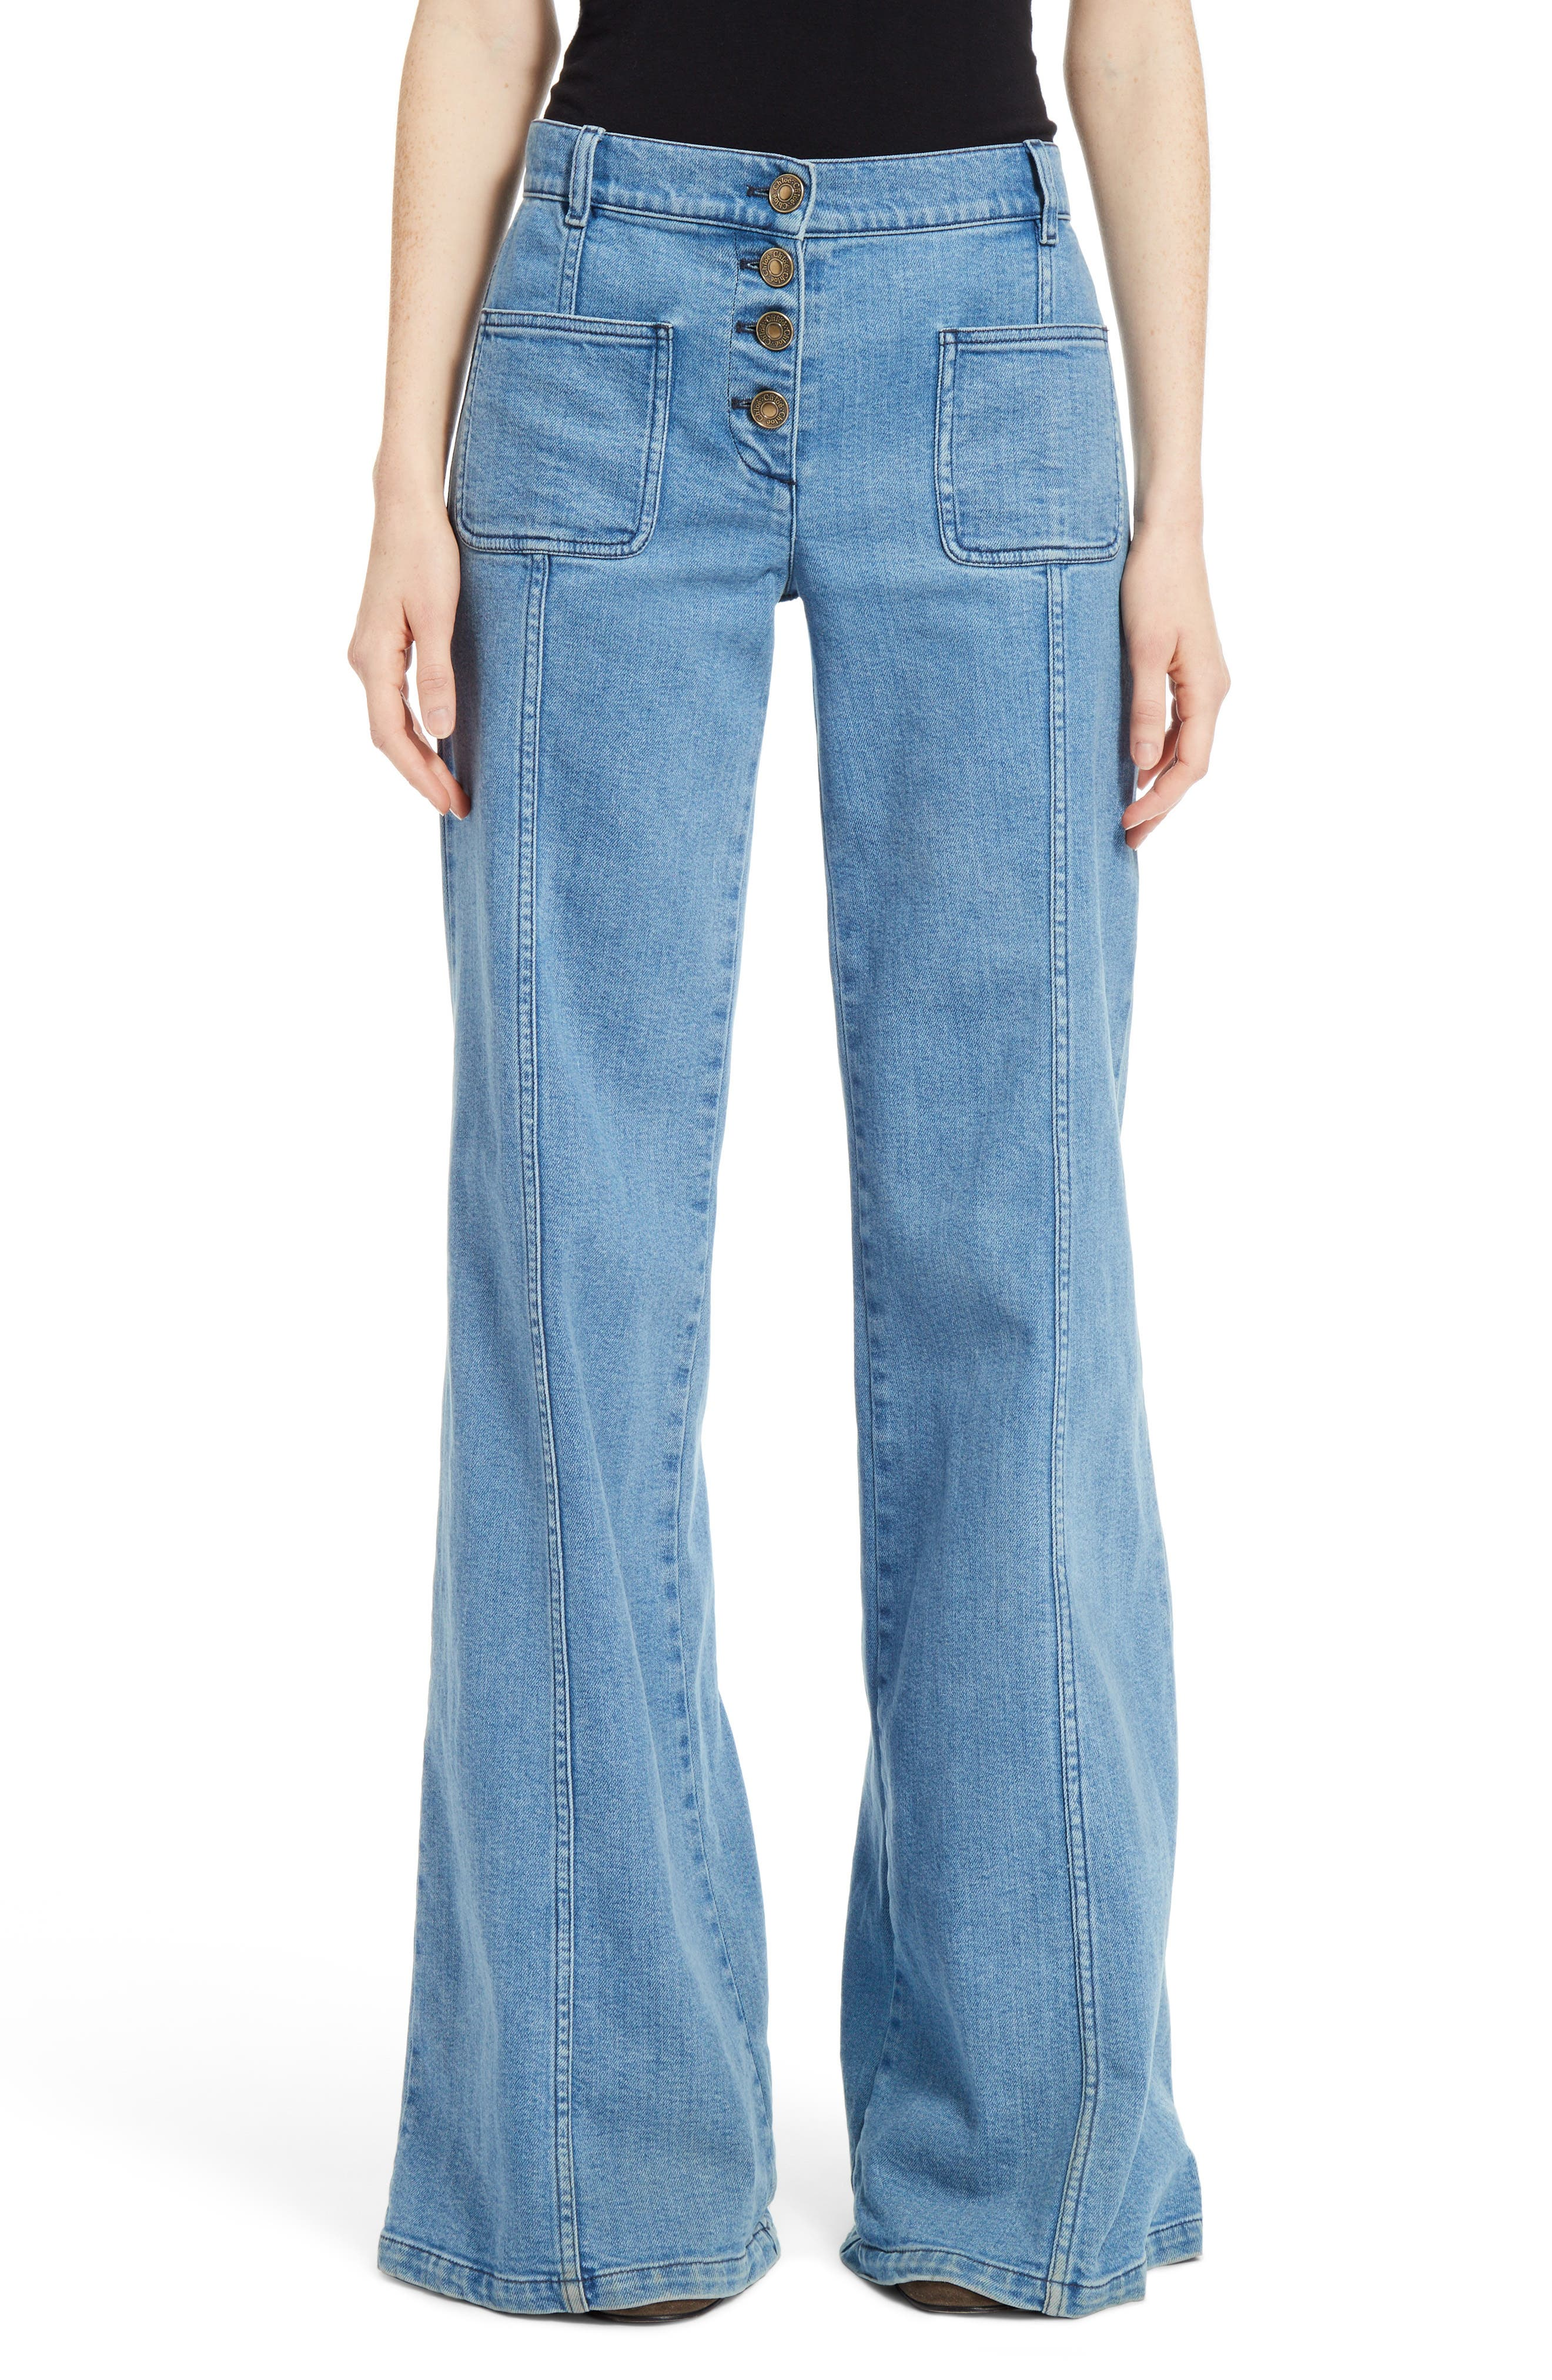 Chloé Flare Jeans